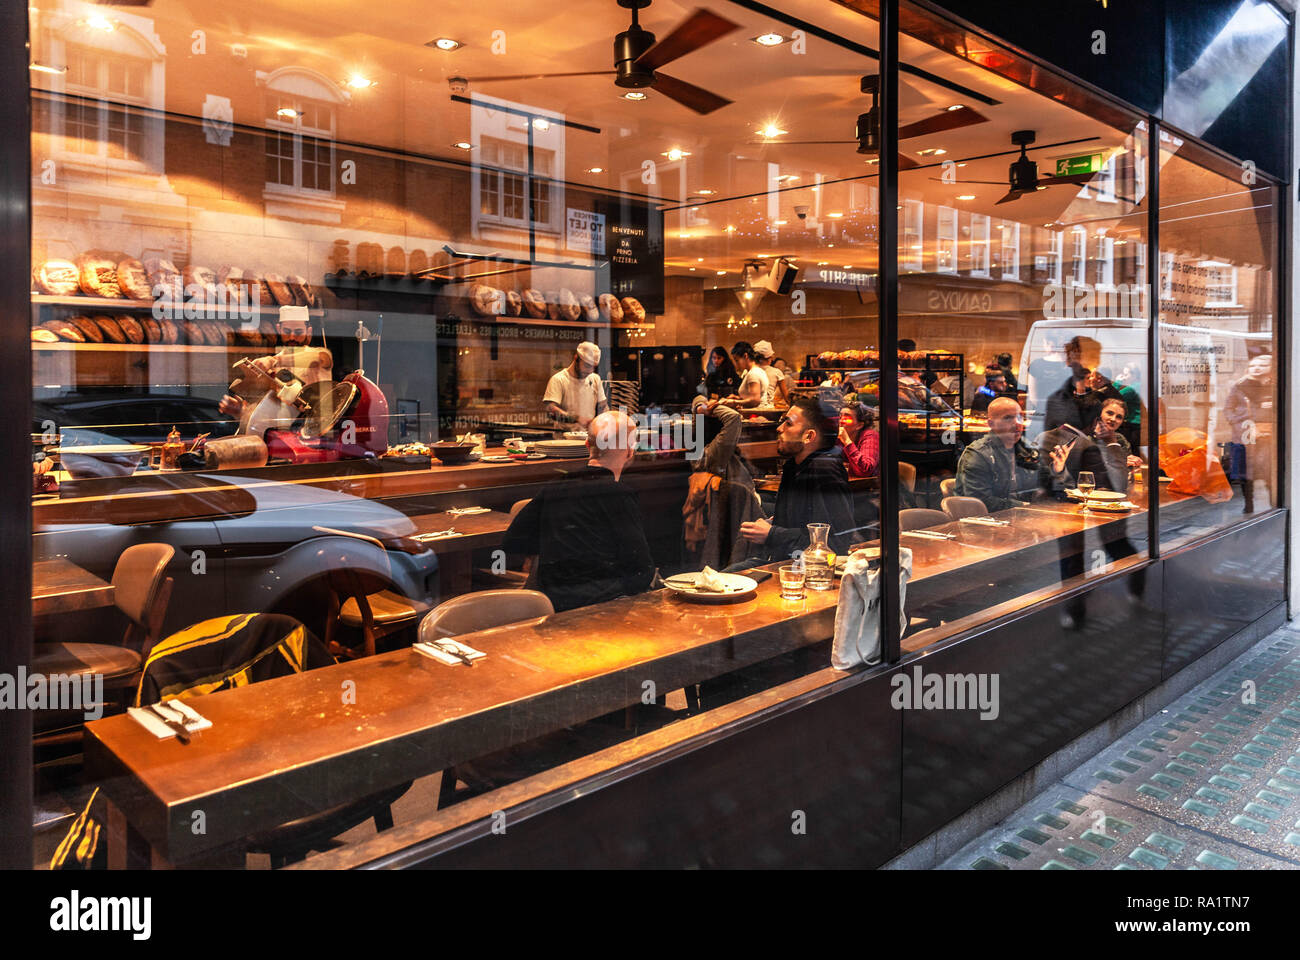 Customers inside Princi bakery, Wardour street, Soho, London, England, UK. - Stock Image